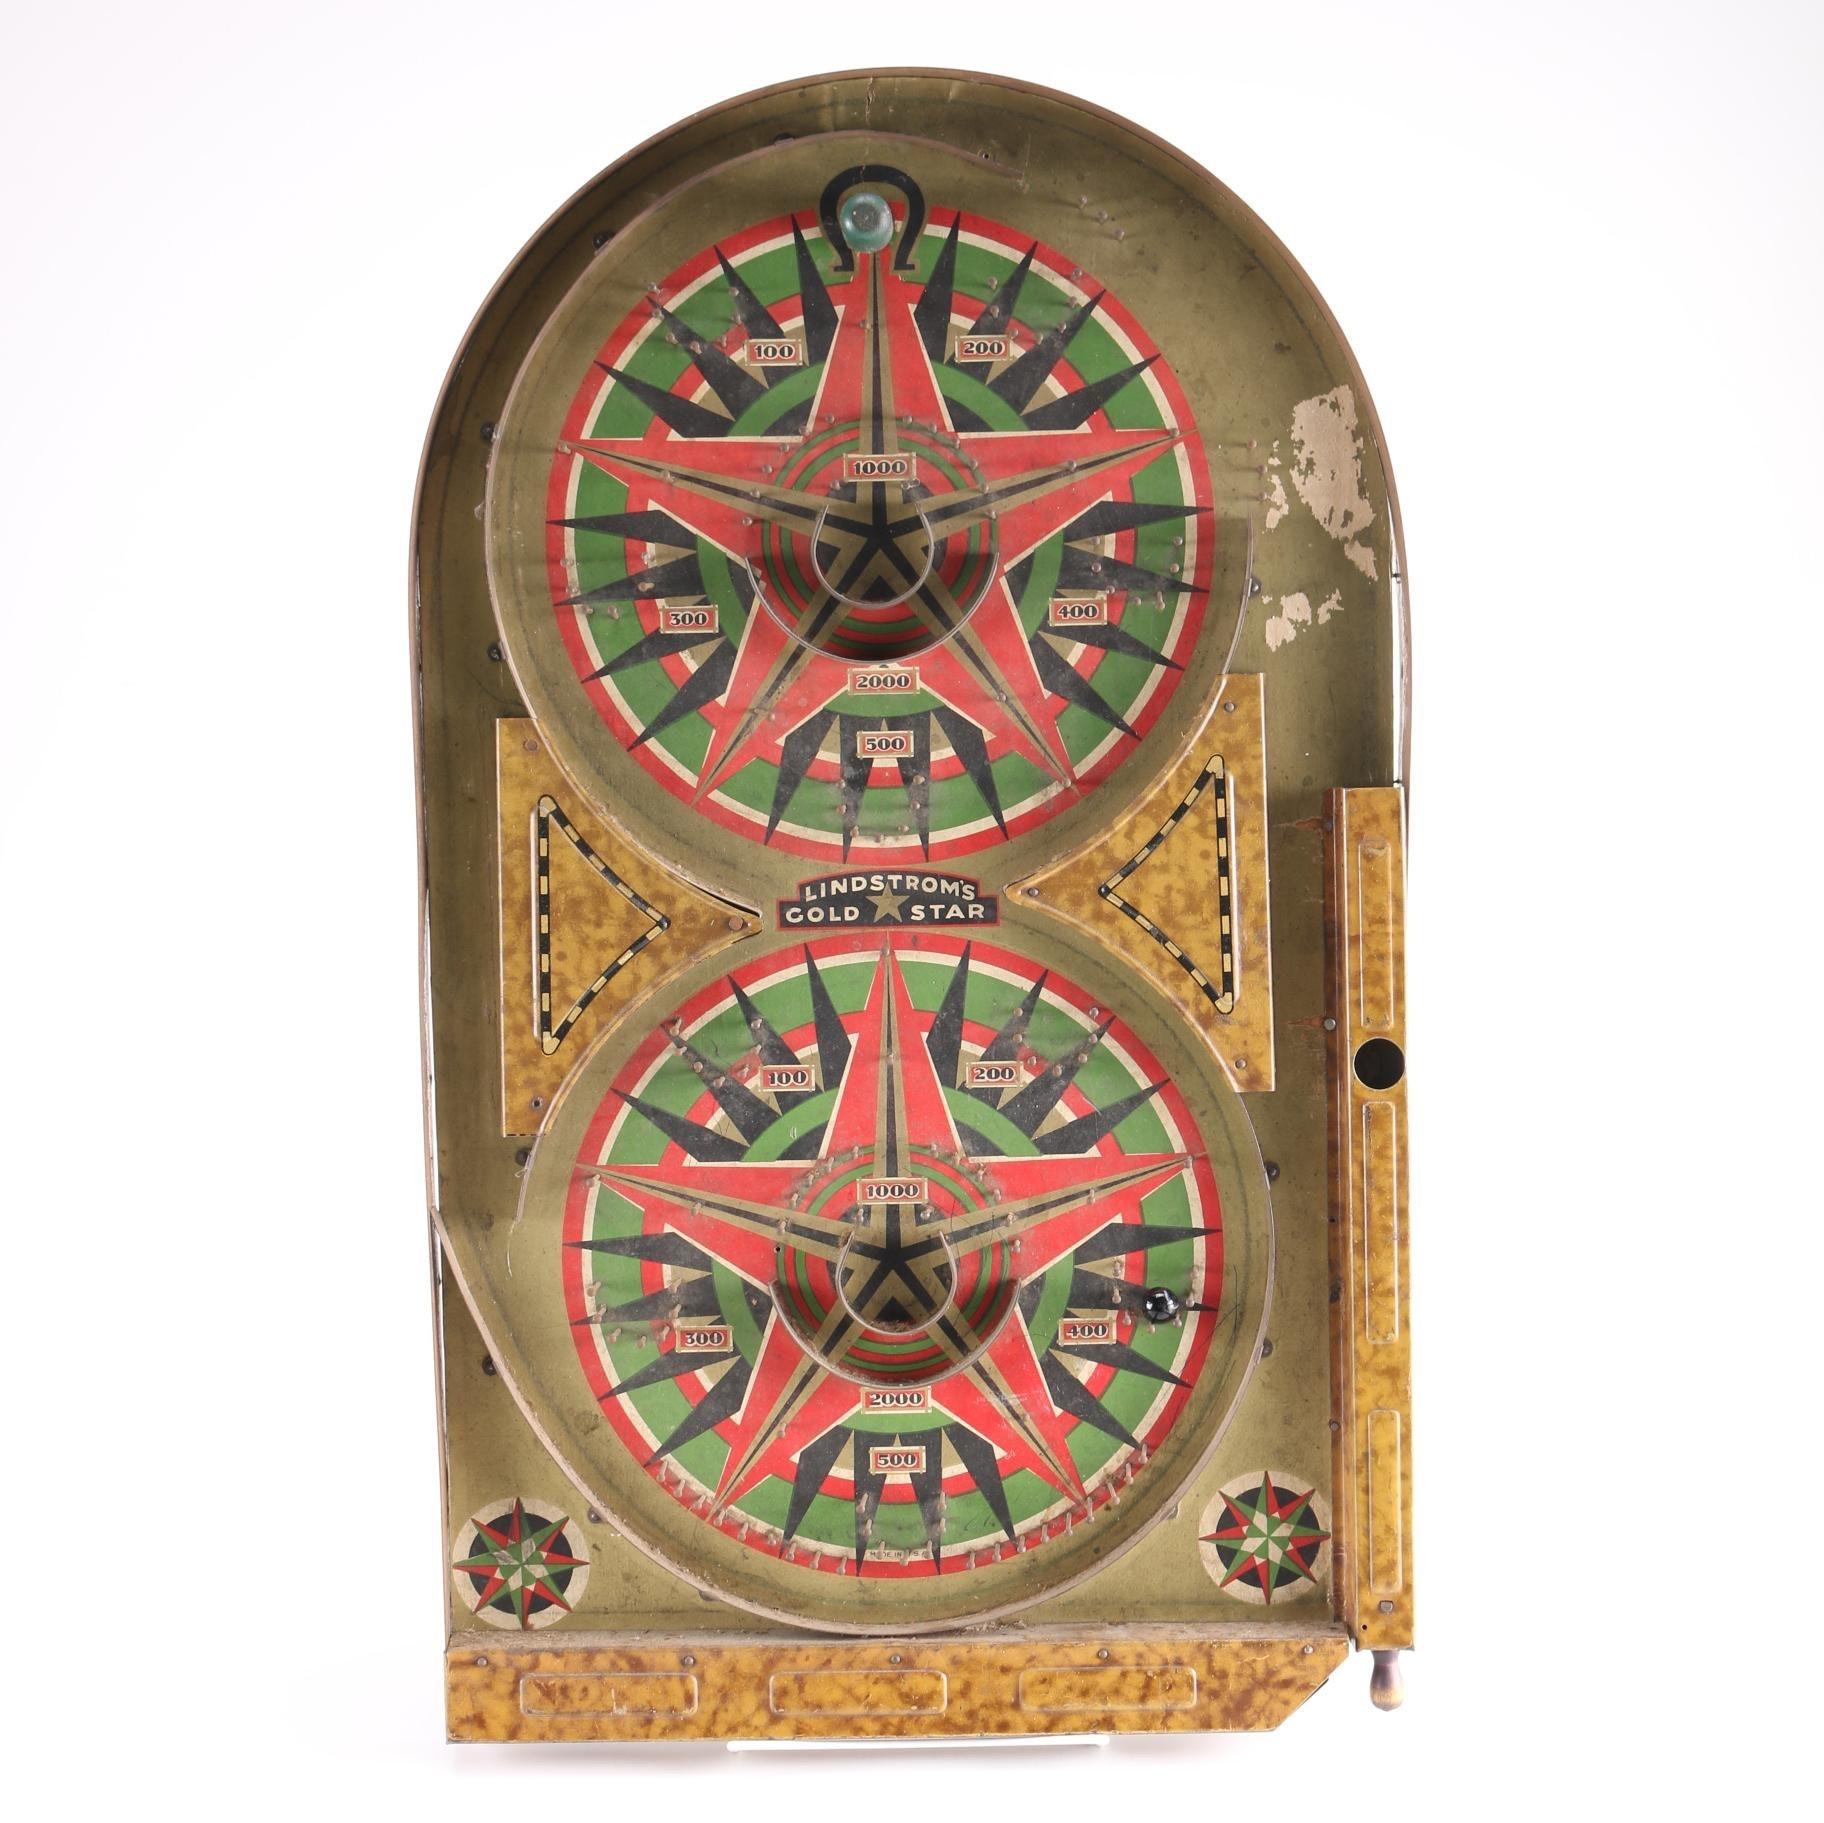 "Vintage Lindstrom ""Gold Star"" Pinball Machine"